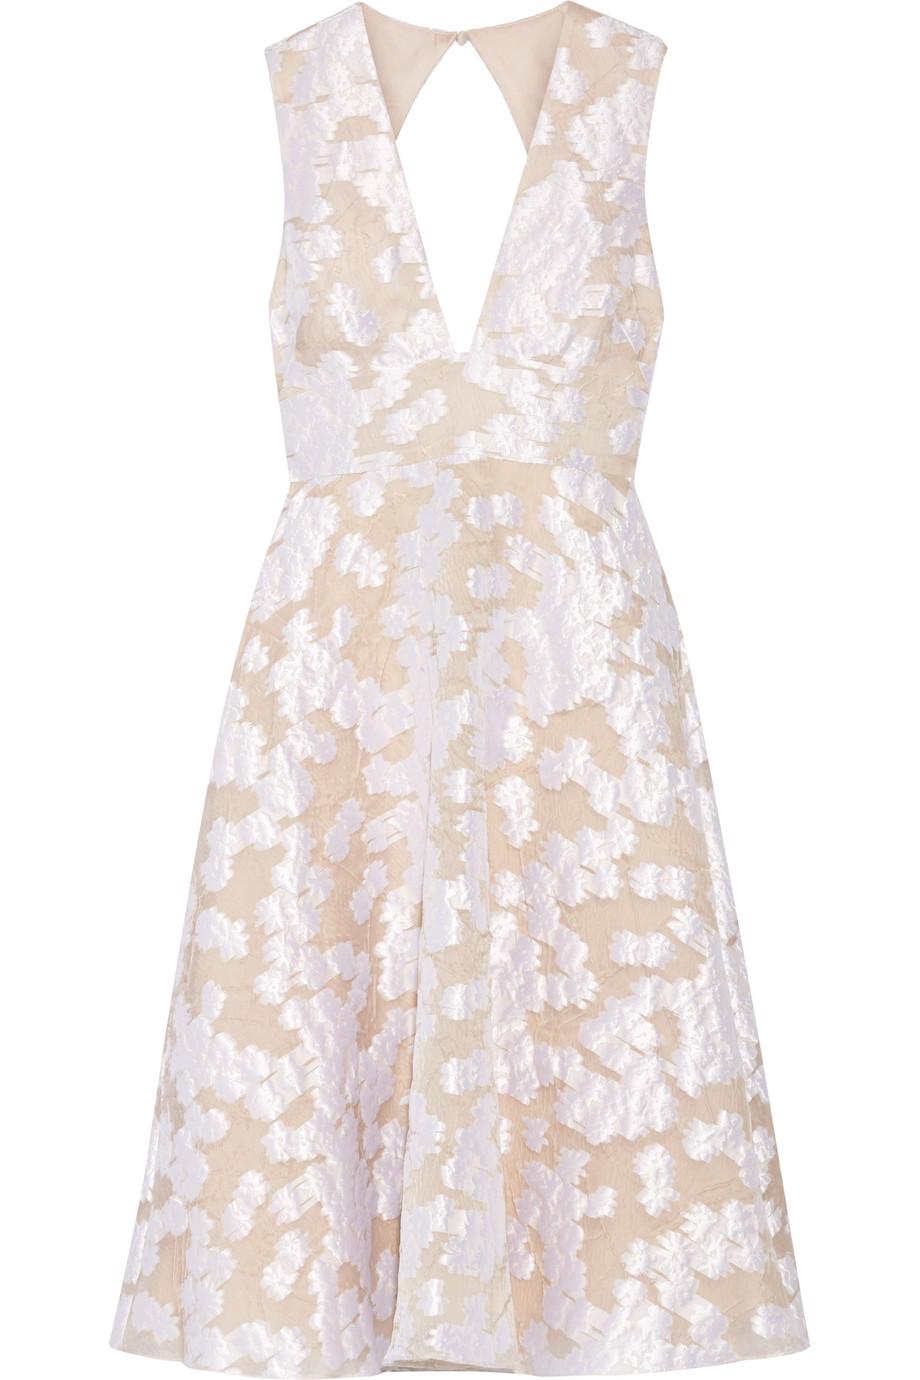 Lela Rose Open-Back Fil Coupé Dress, Ivory, Women's, Size: 14